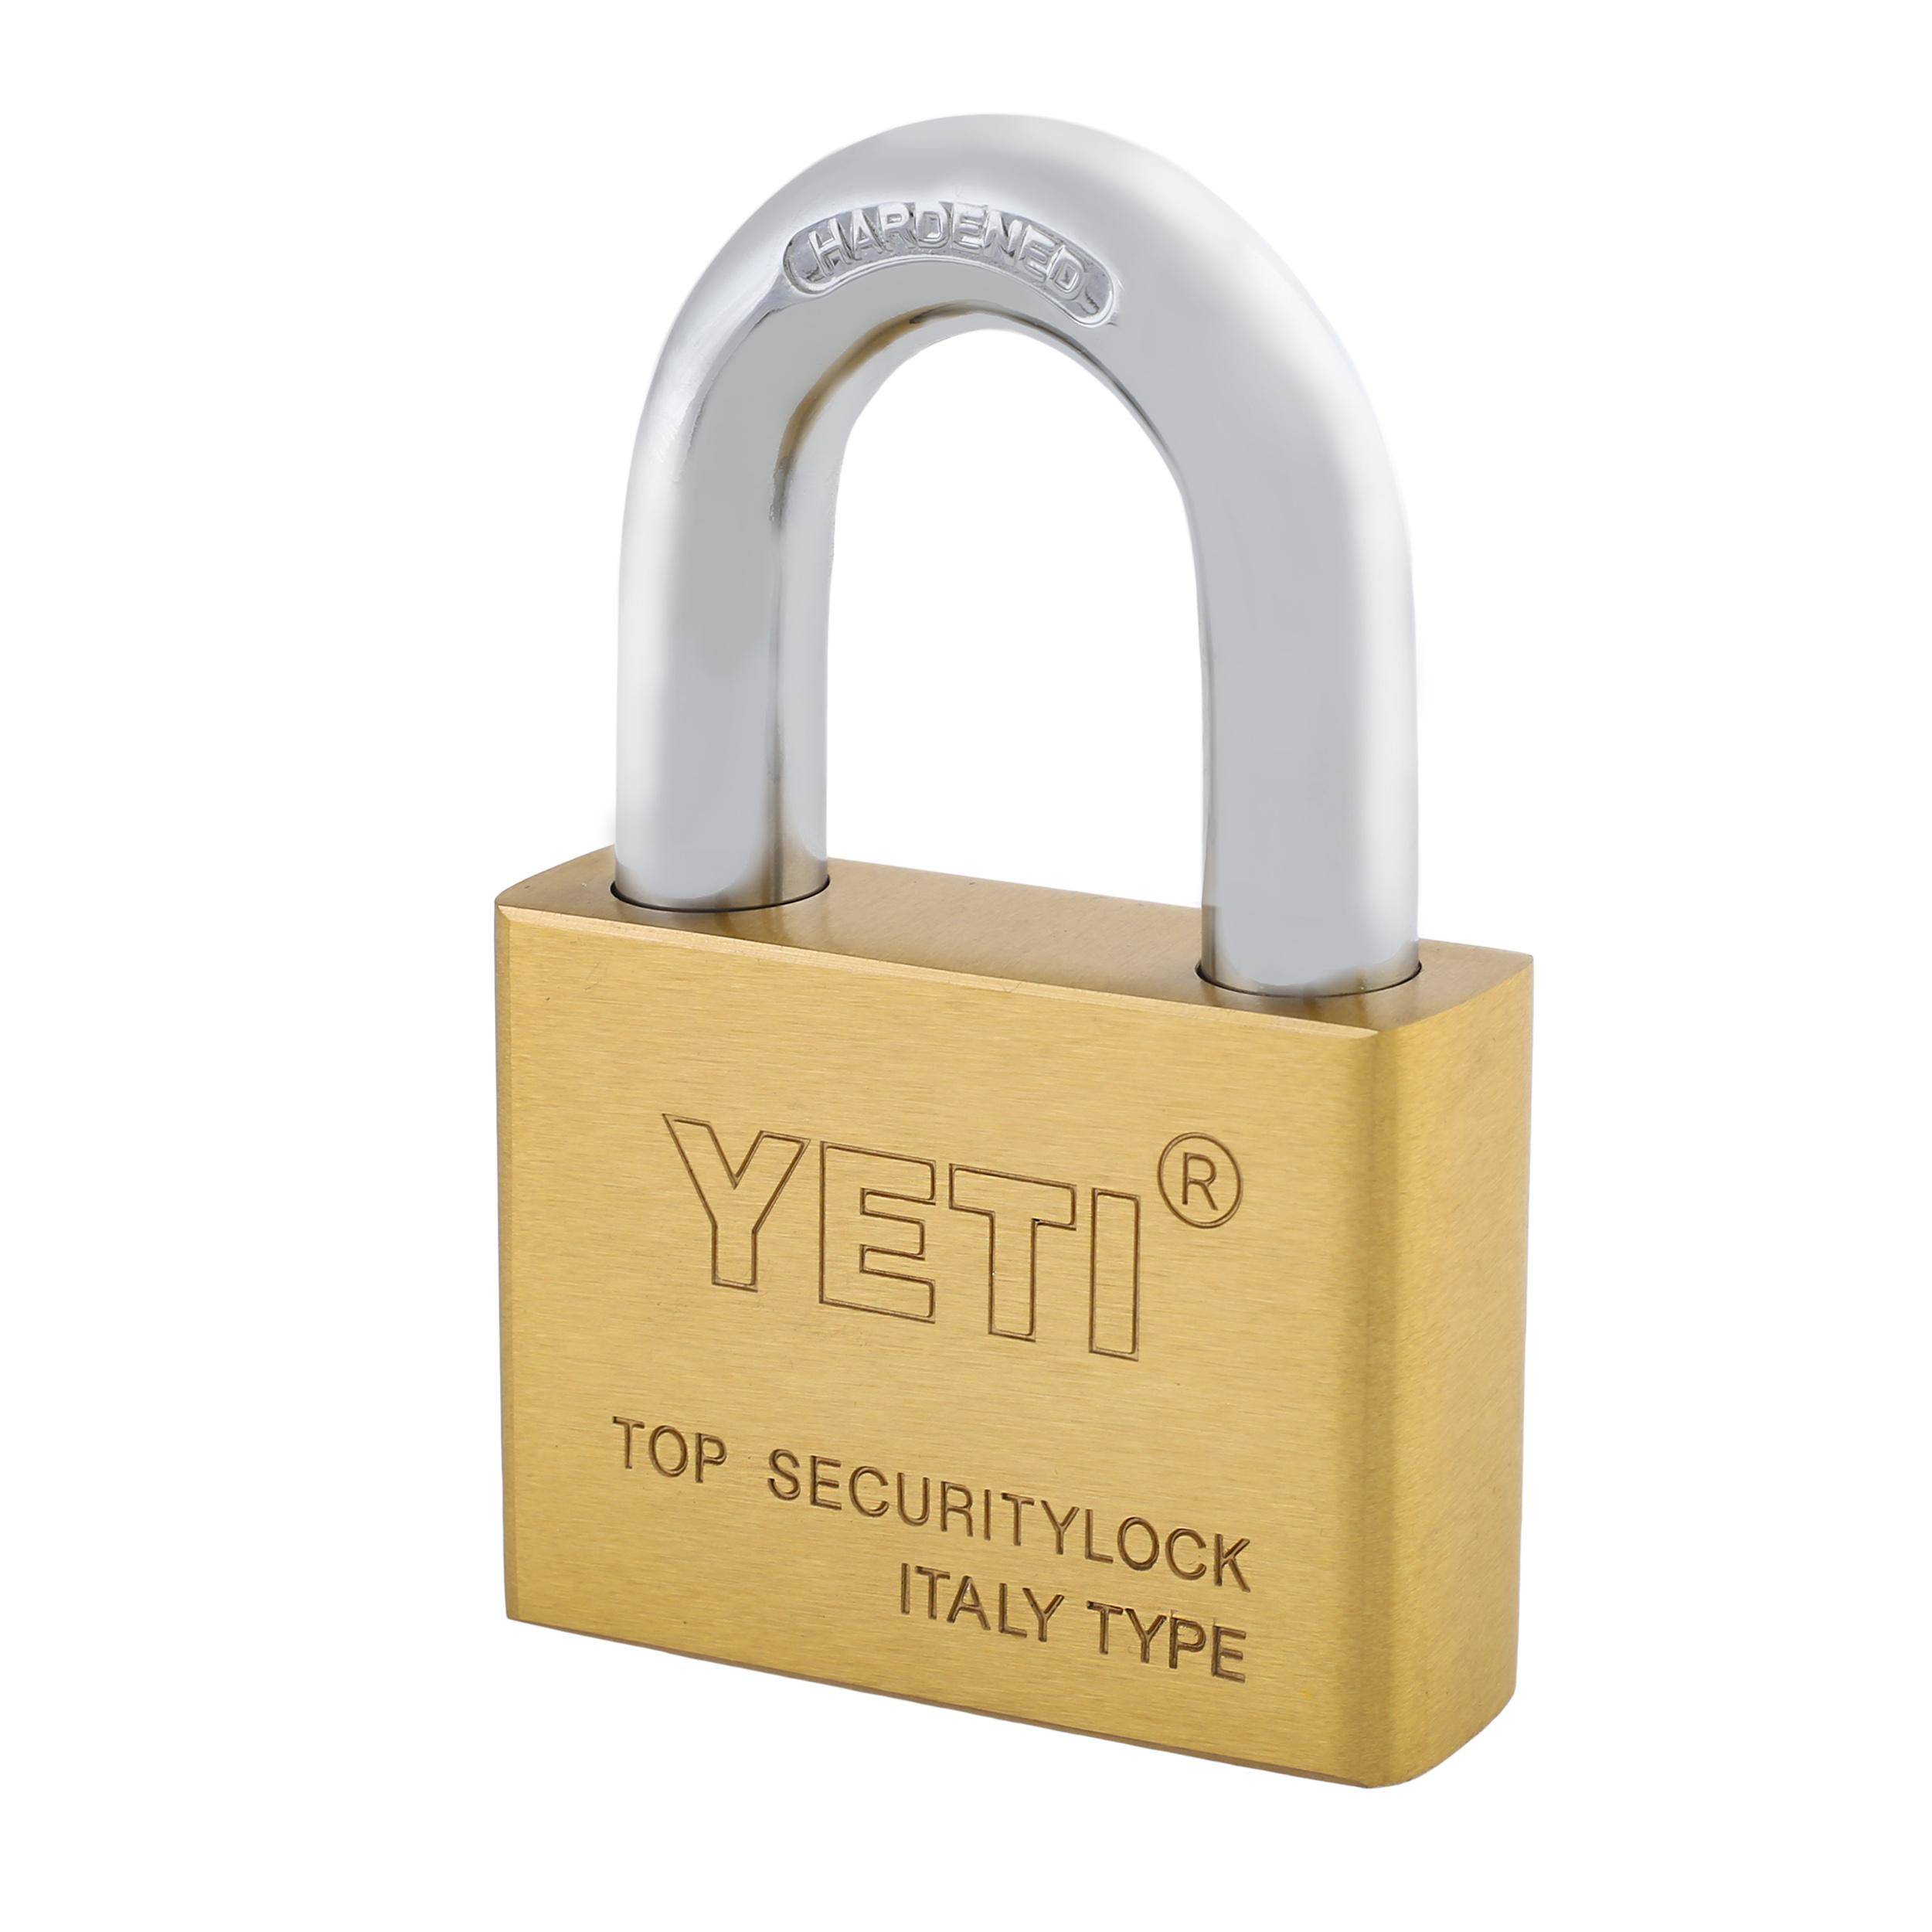 قفل آویز یتی مدل 70 Solex